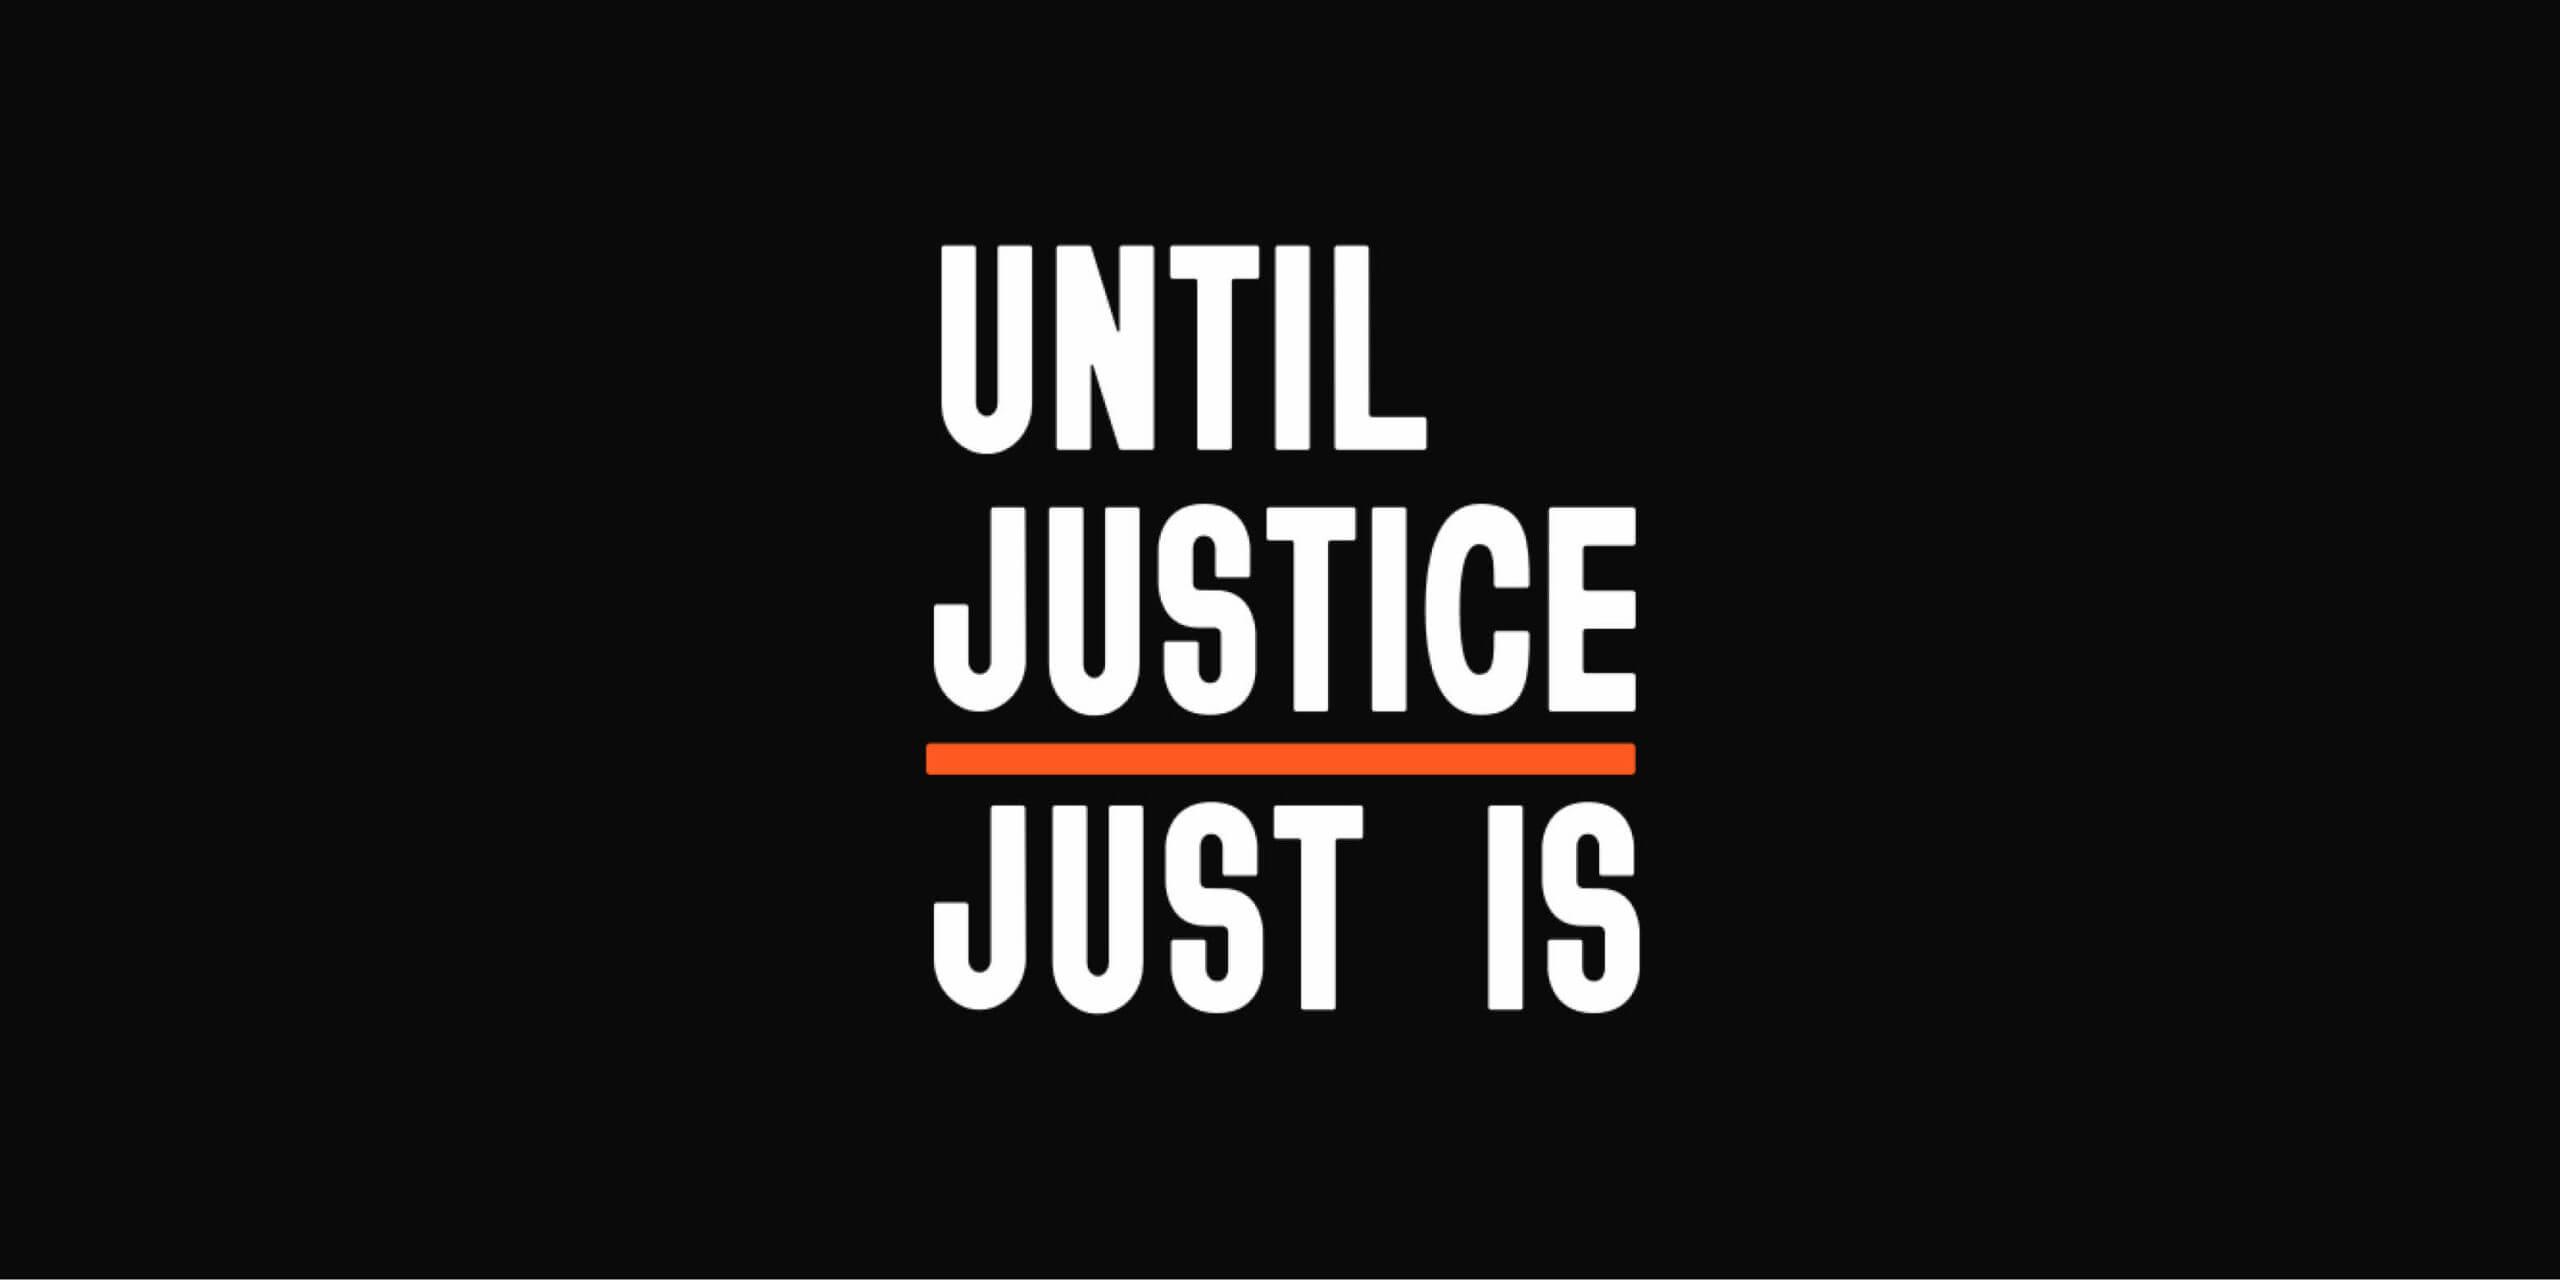 Until Justice Just Is logo on black background